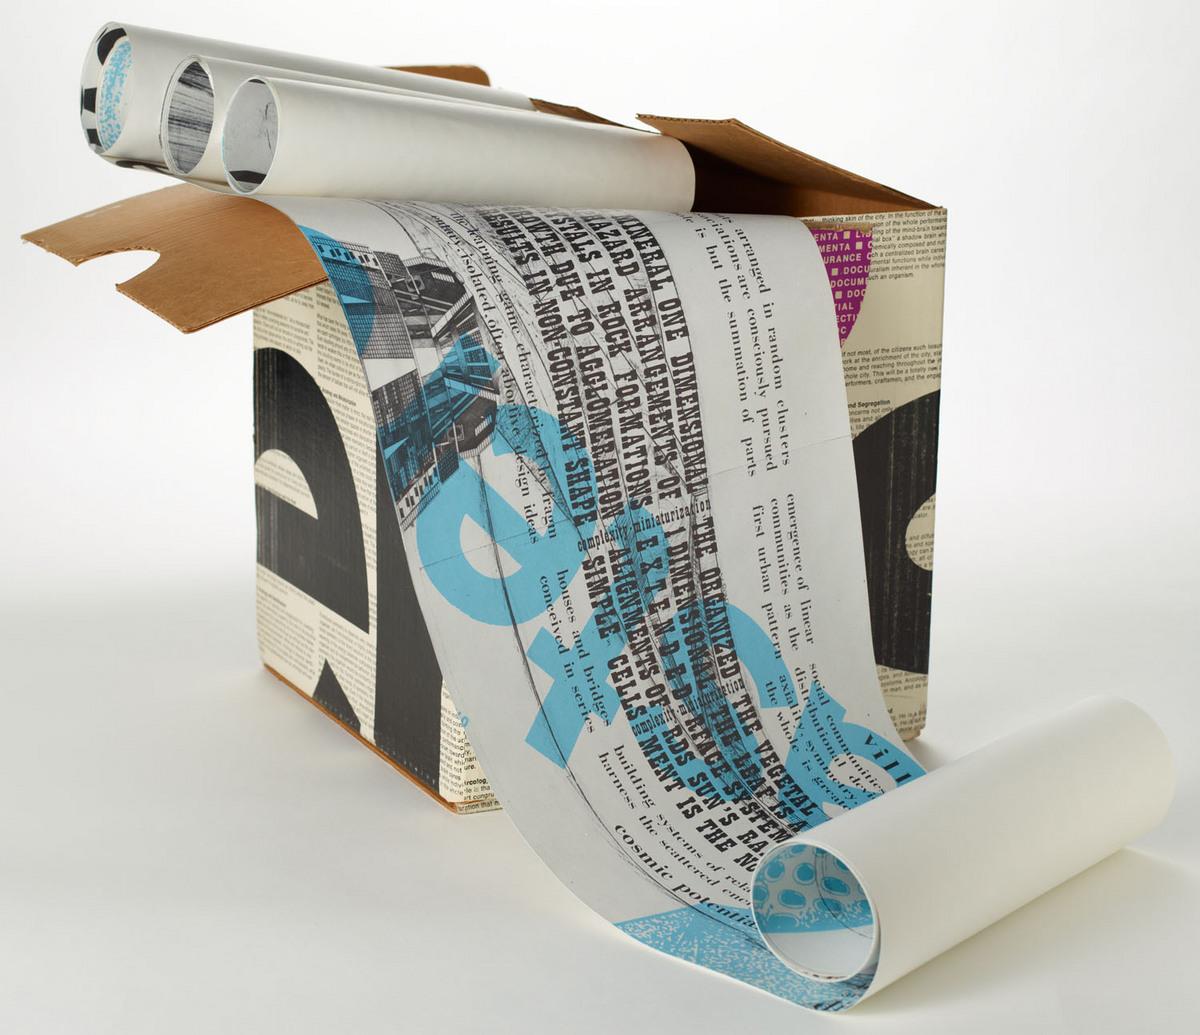 Documenta; the Paolo Soleri retrospective. Unrolled illustration with case